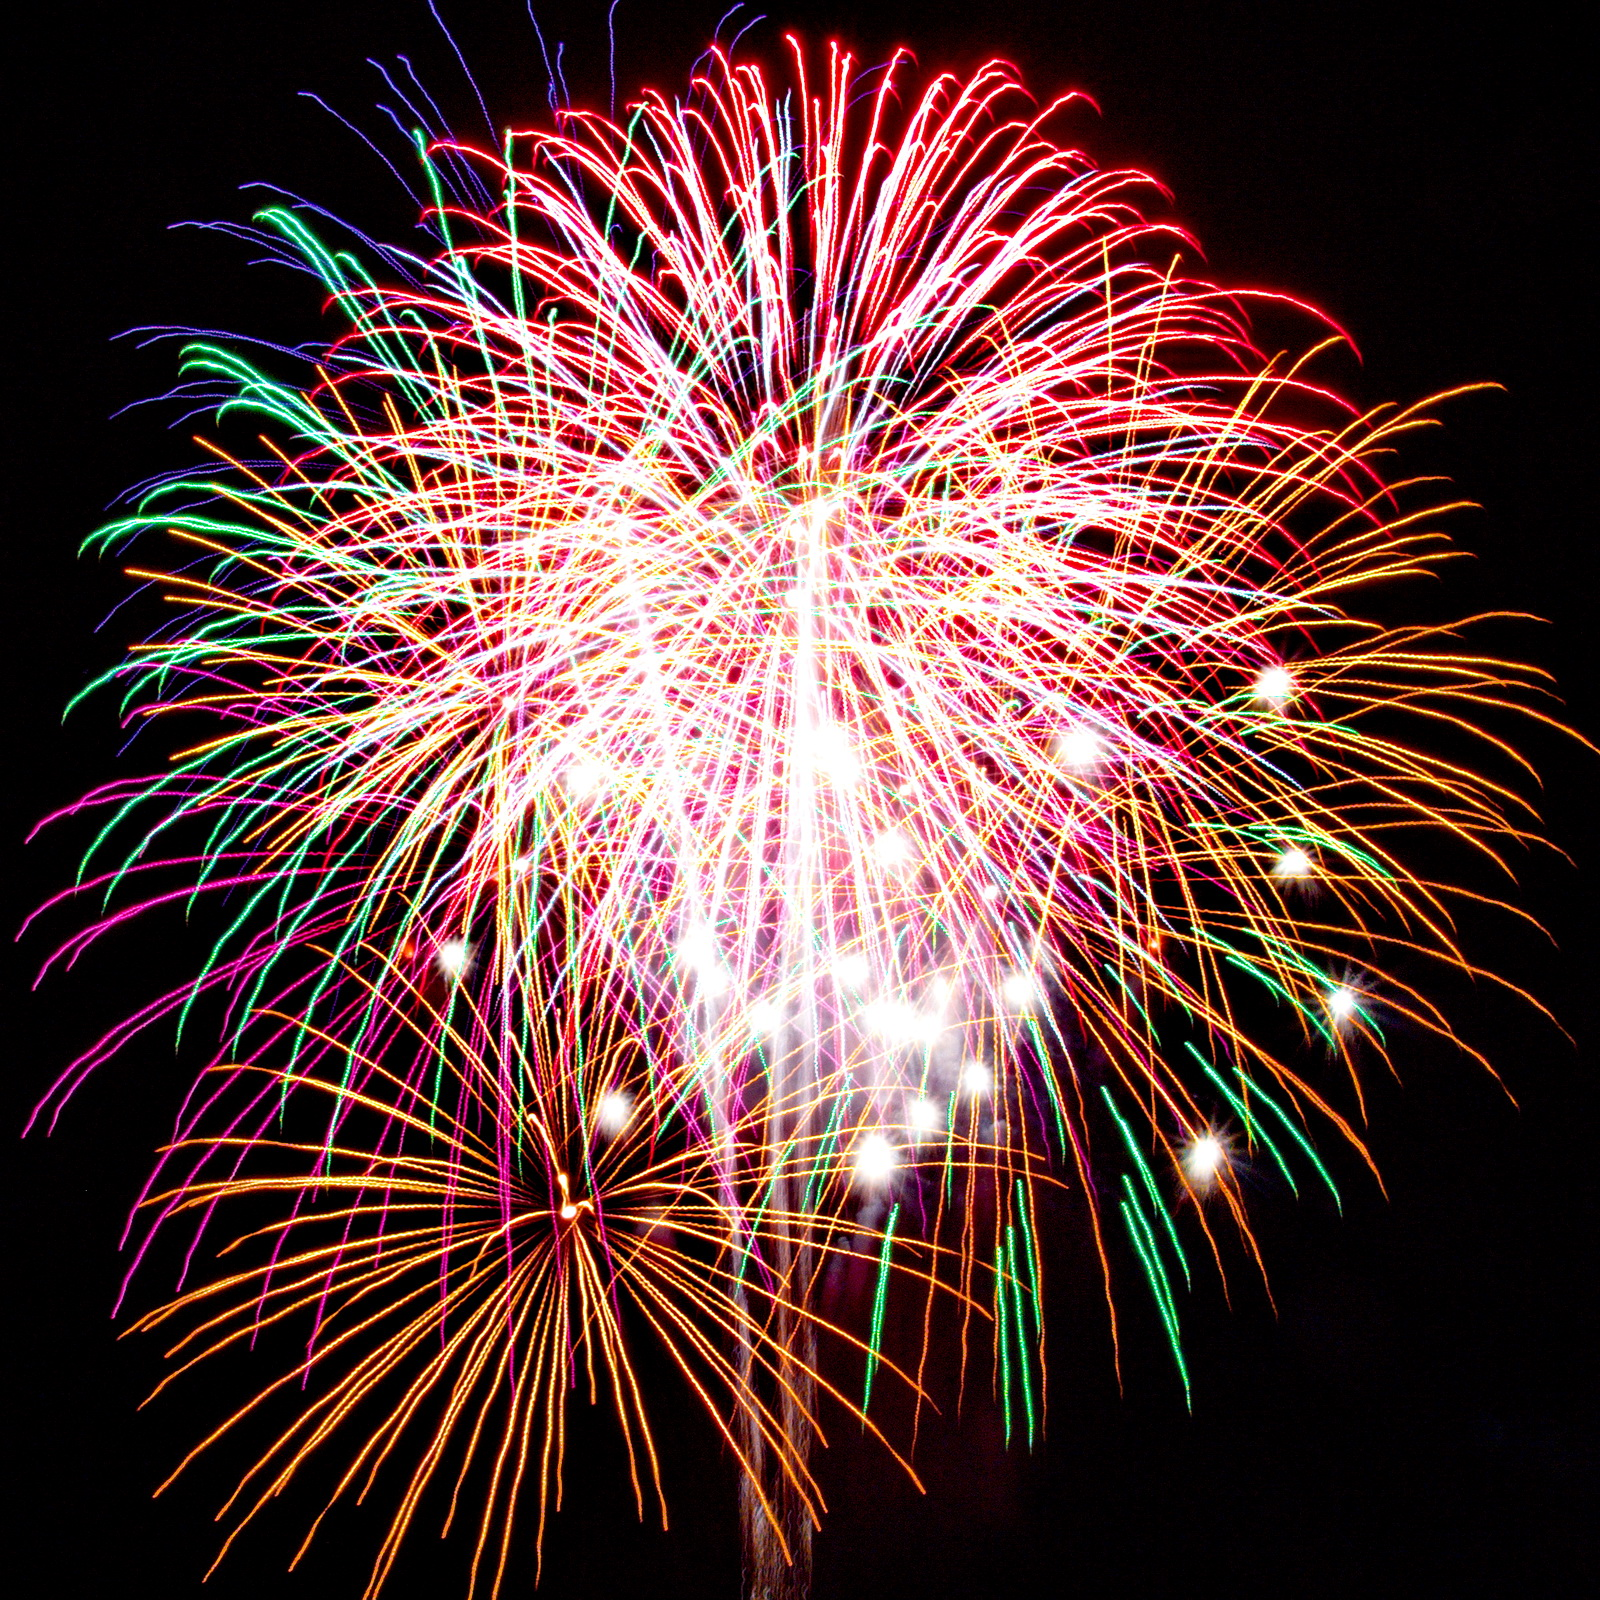 Massachusetts Fireworks go2.guide multicolored spectacular